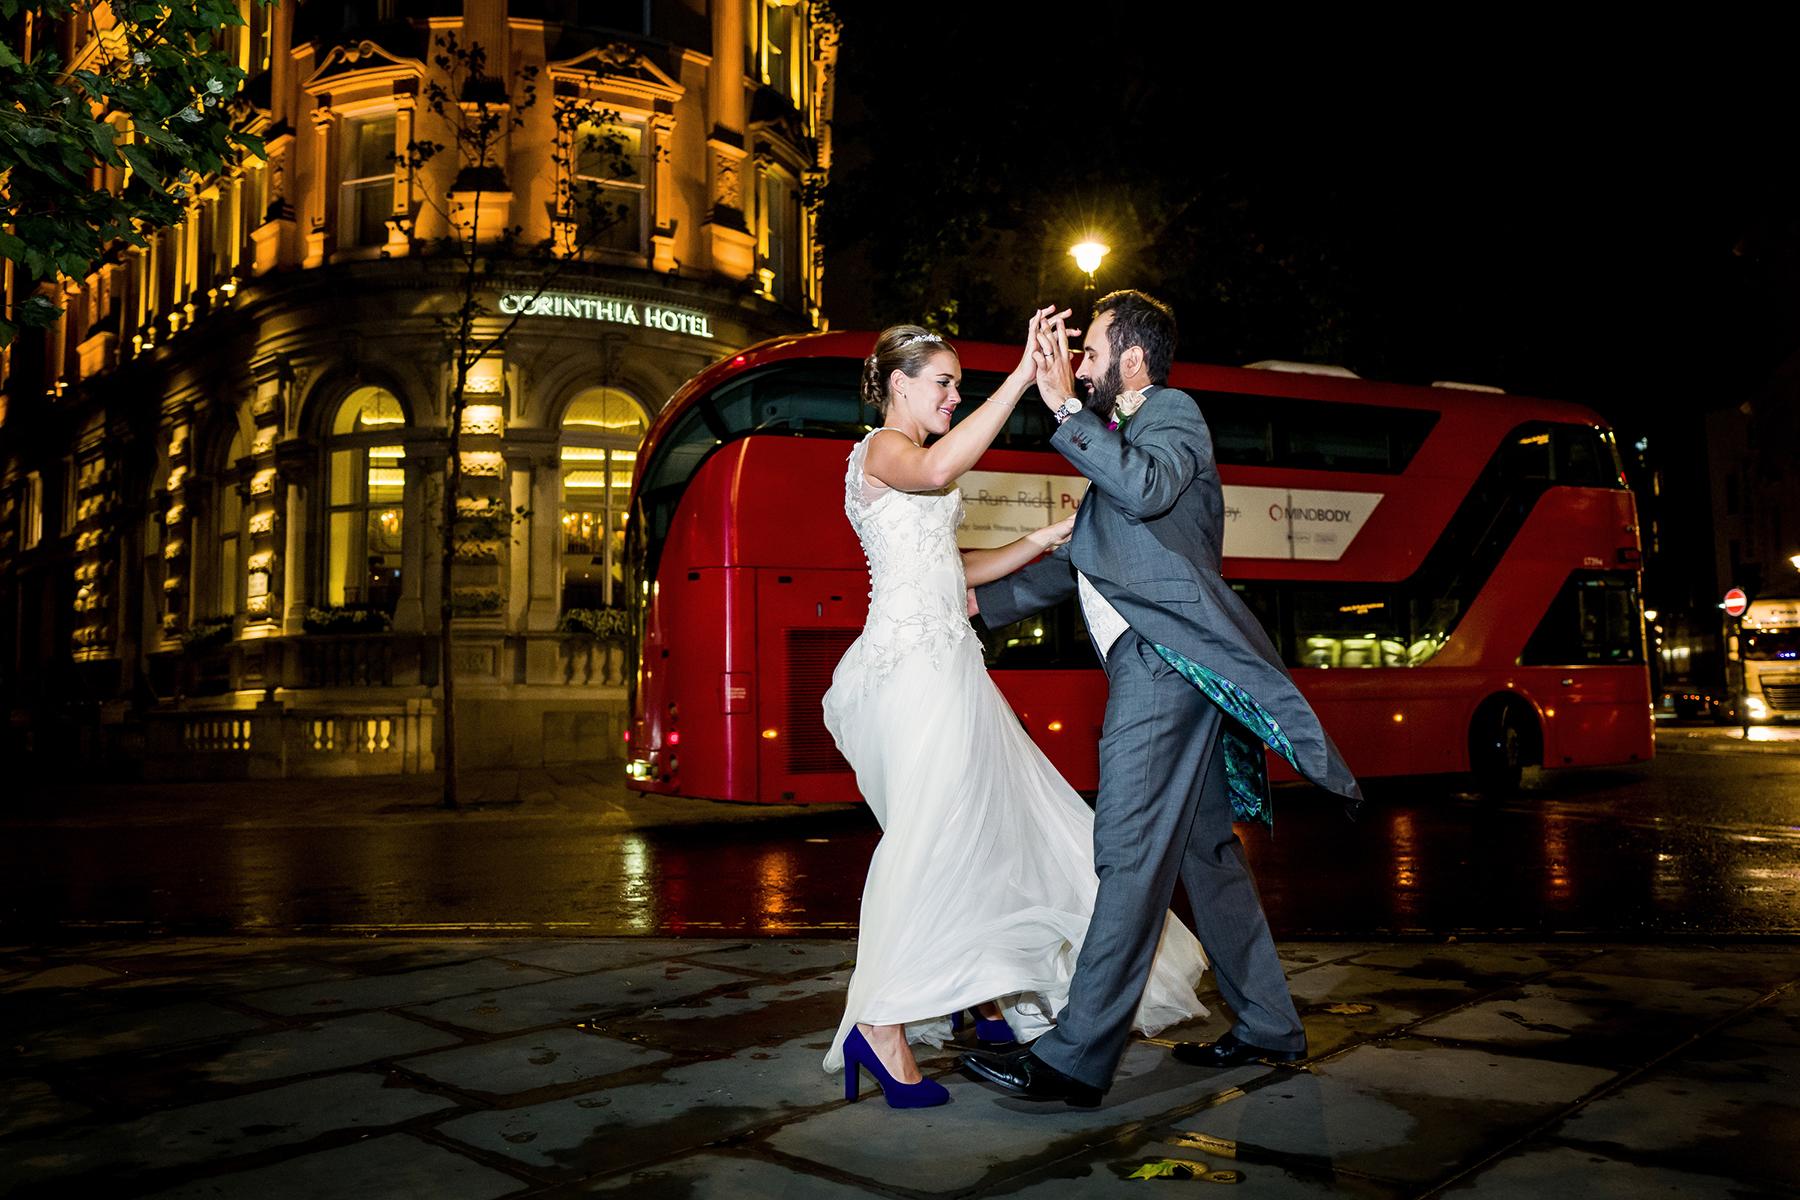 corinthia hotel weddings